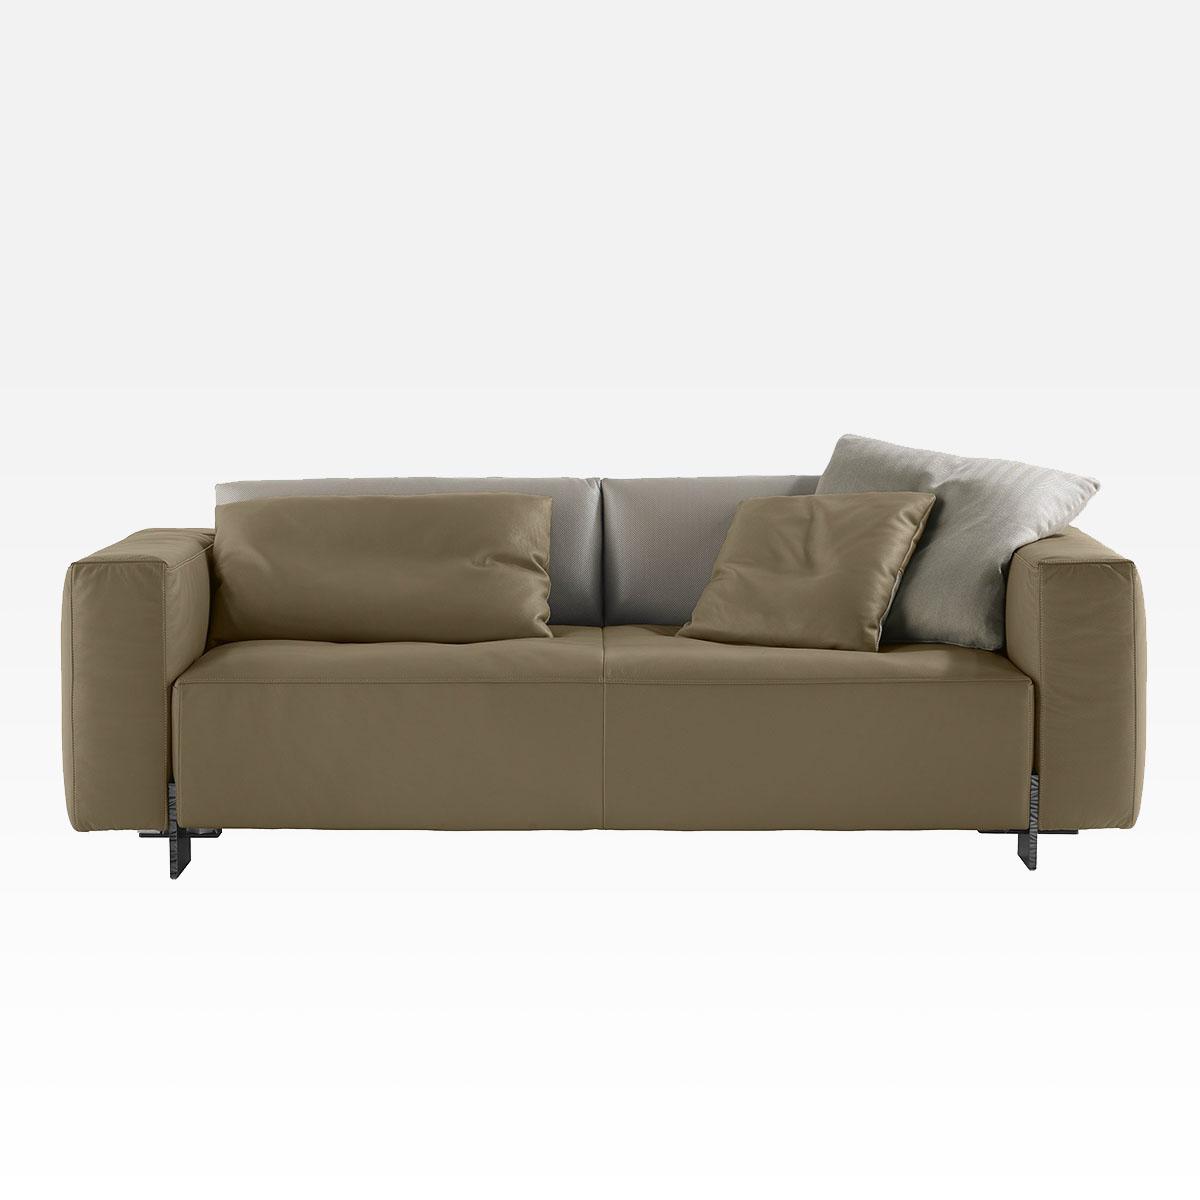 sofa-giuong-ngu-giai-phap-hoan-hao-cho-can-ho-cua-ban-12